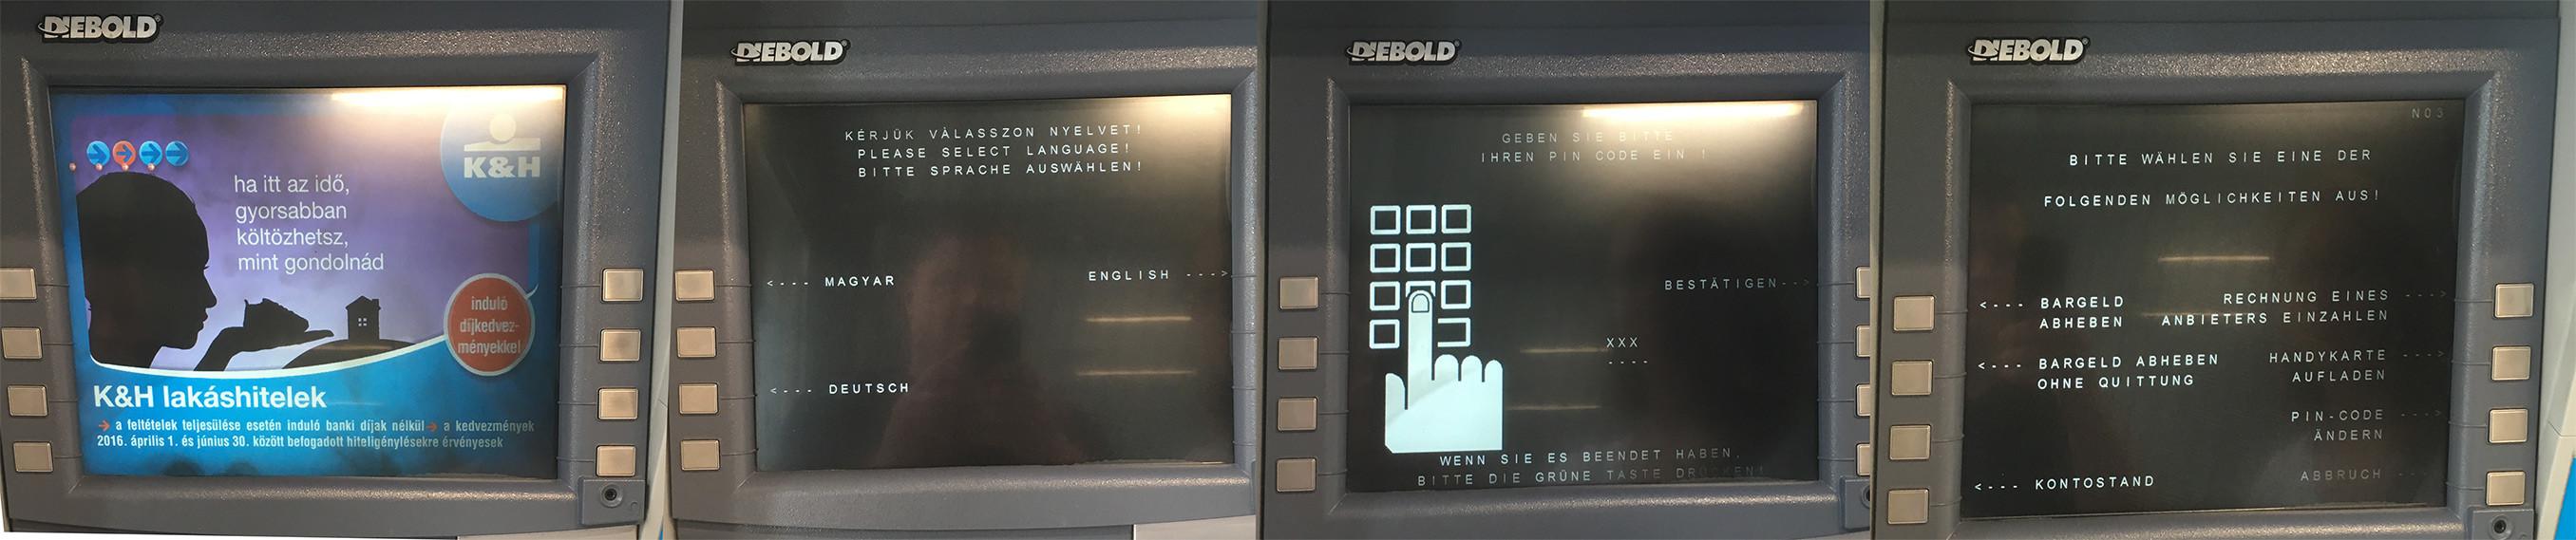 verlust postbank sparcard